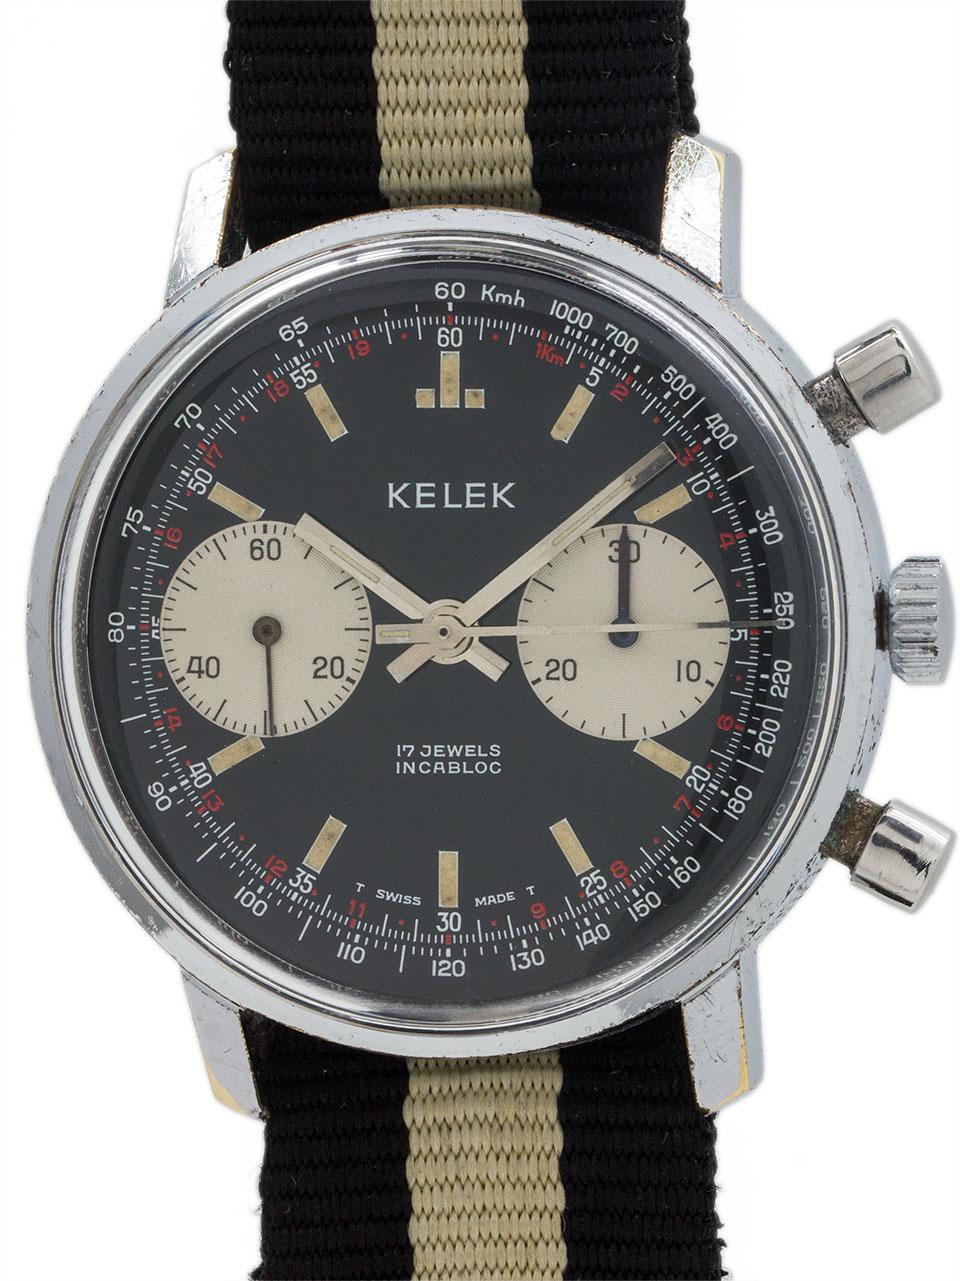 wanna buy a kelek vintage chronograph circa 1960